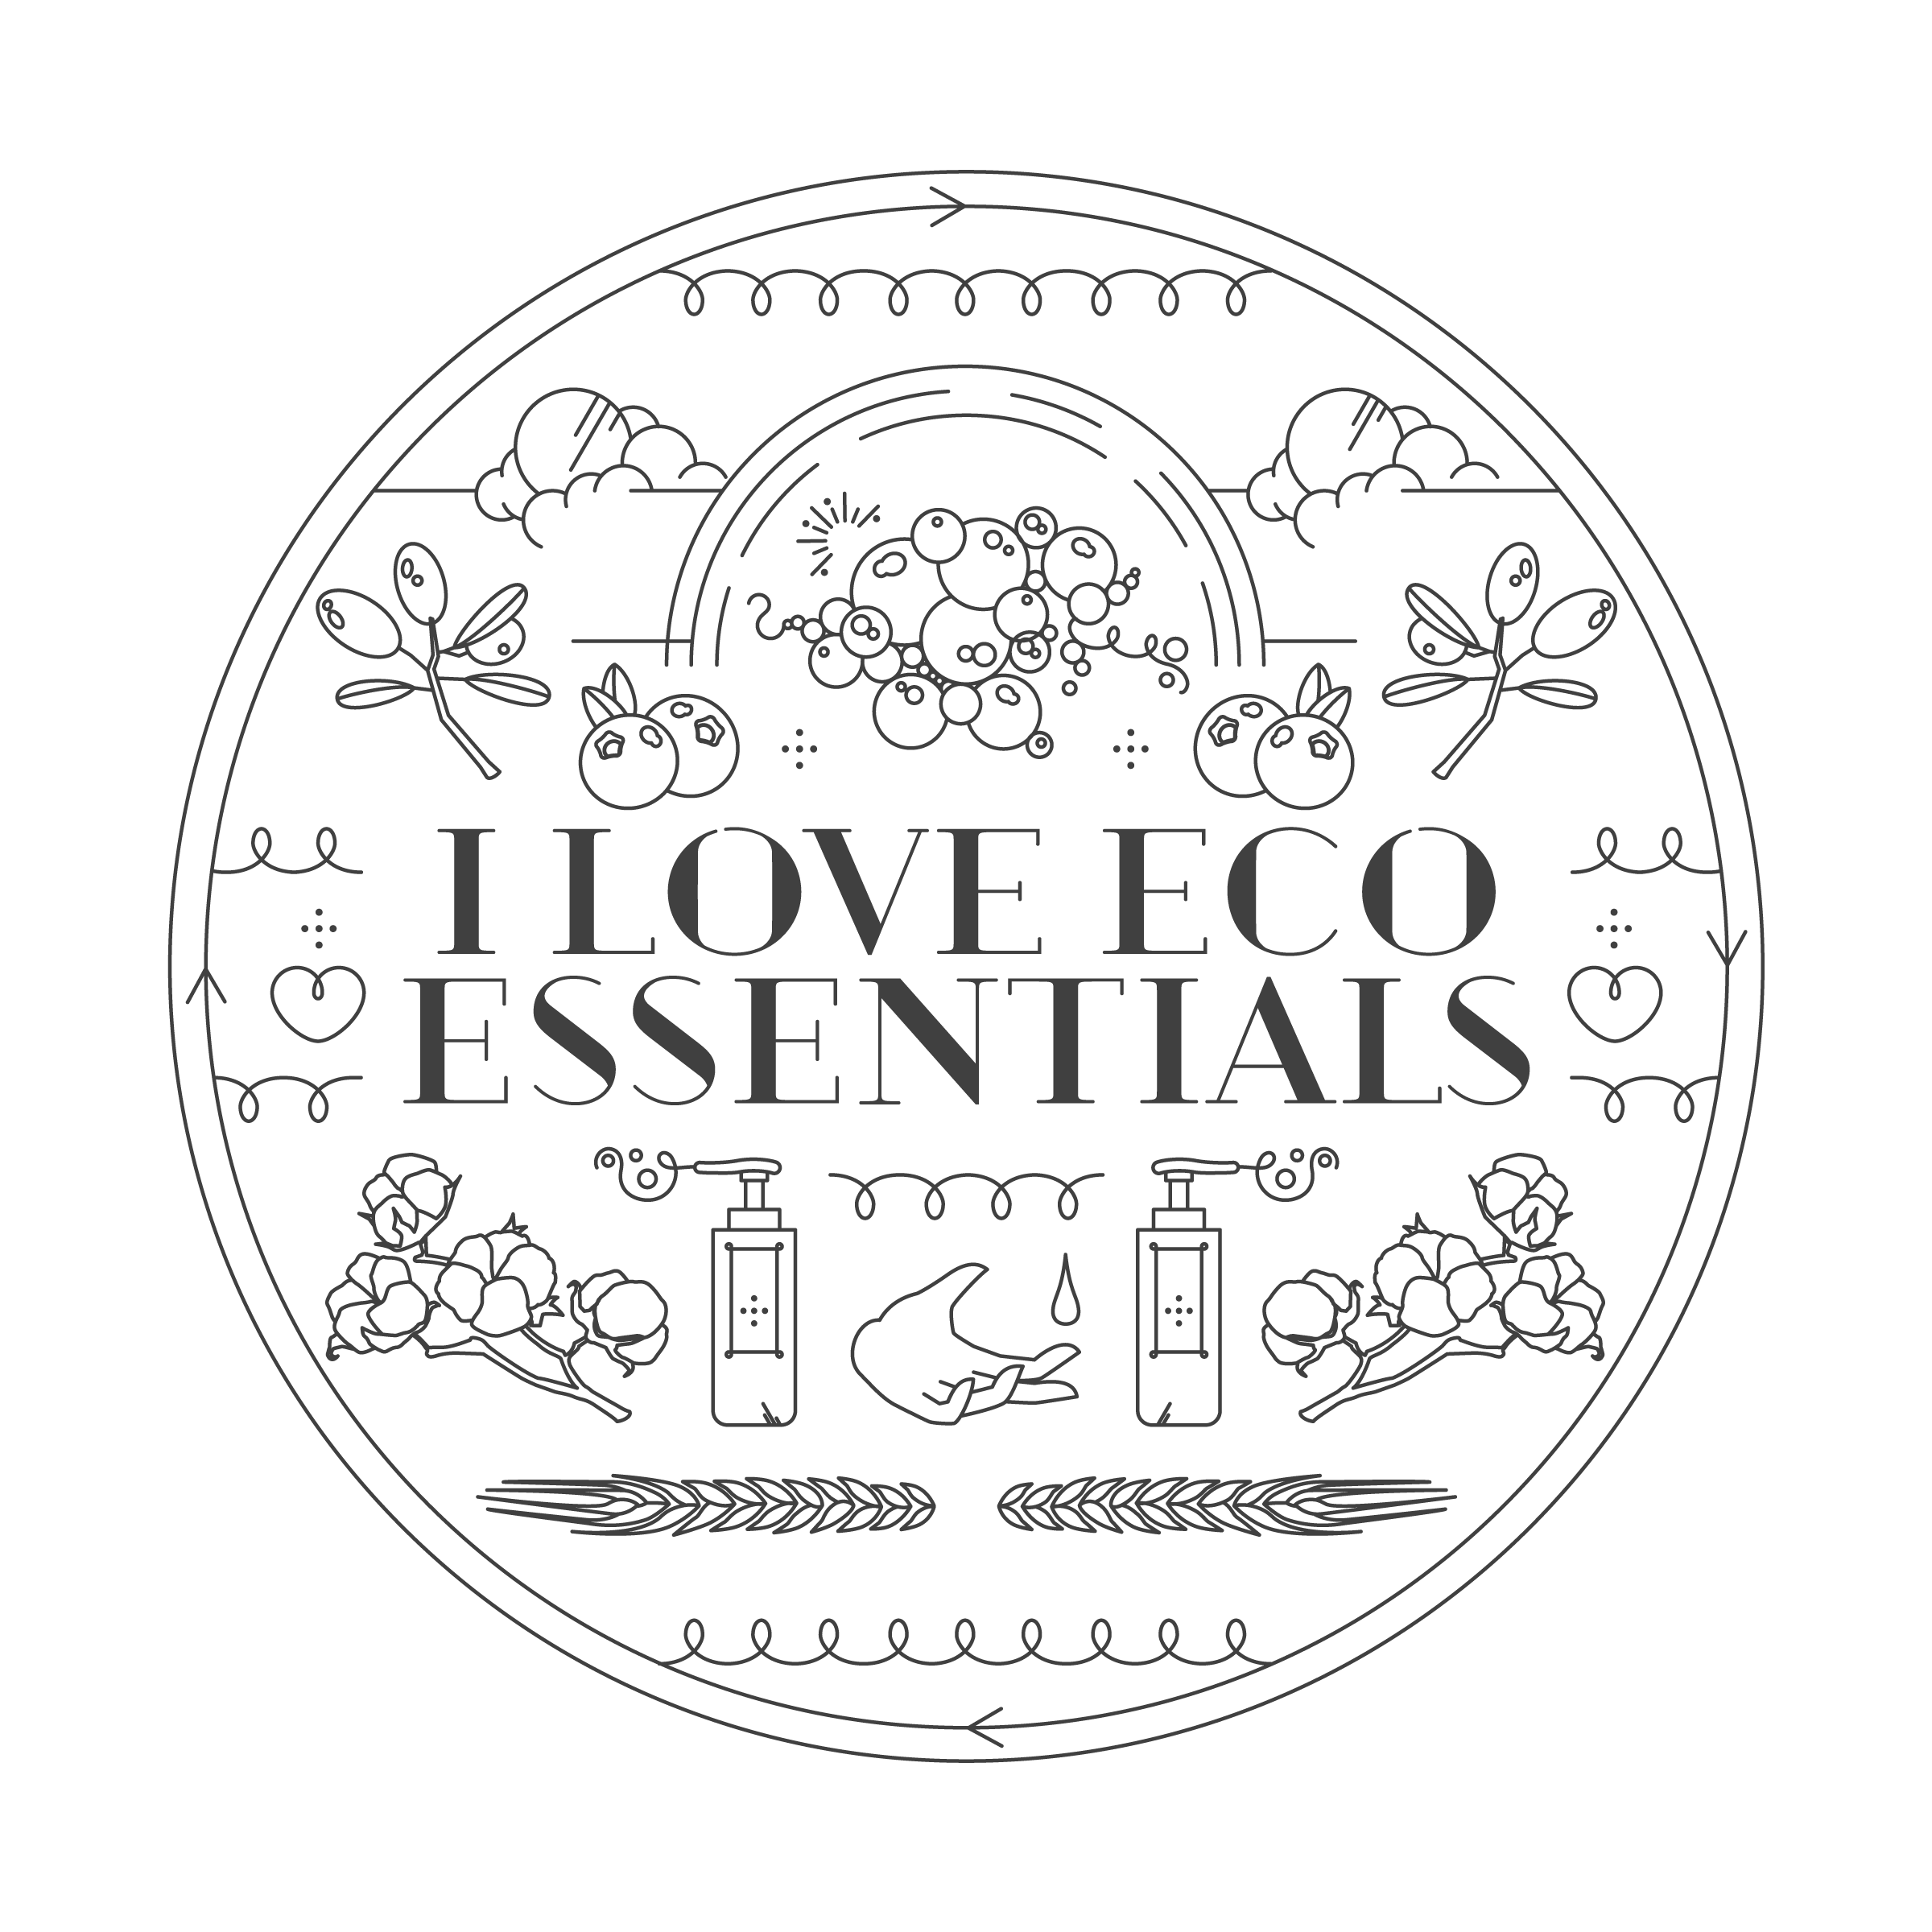 Rotating ILoveEcoEssentials logo